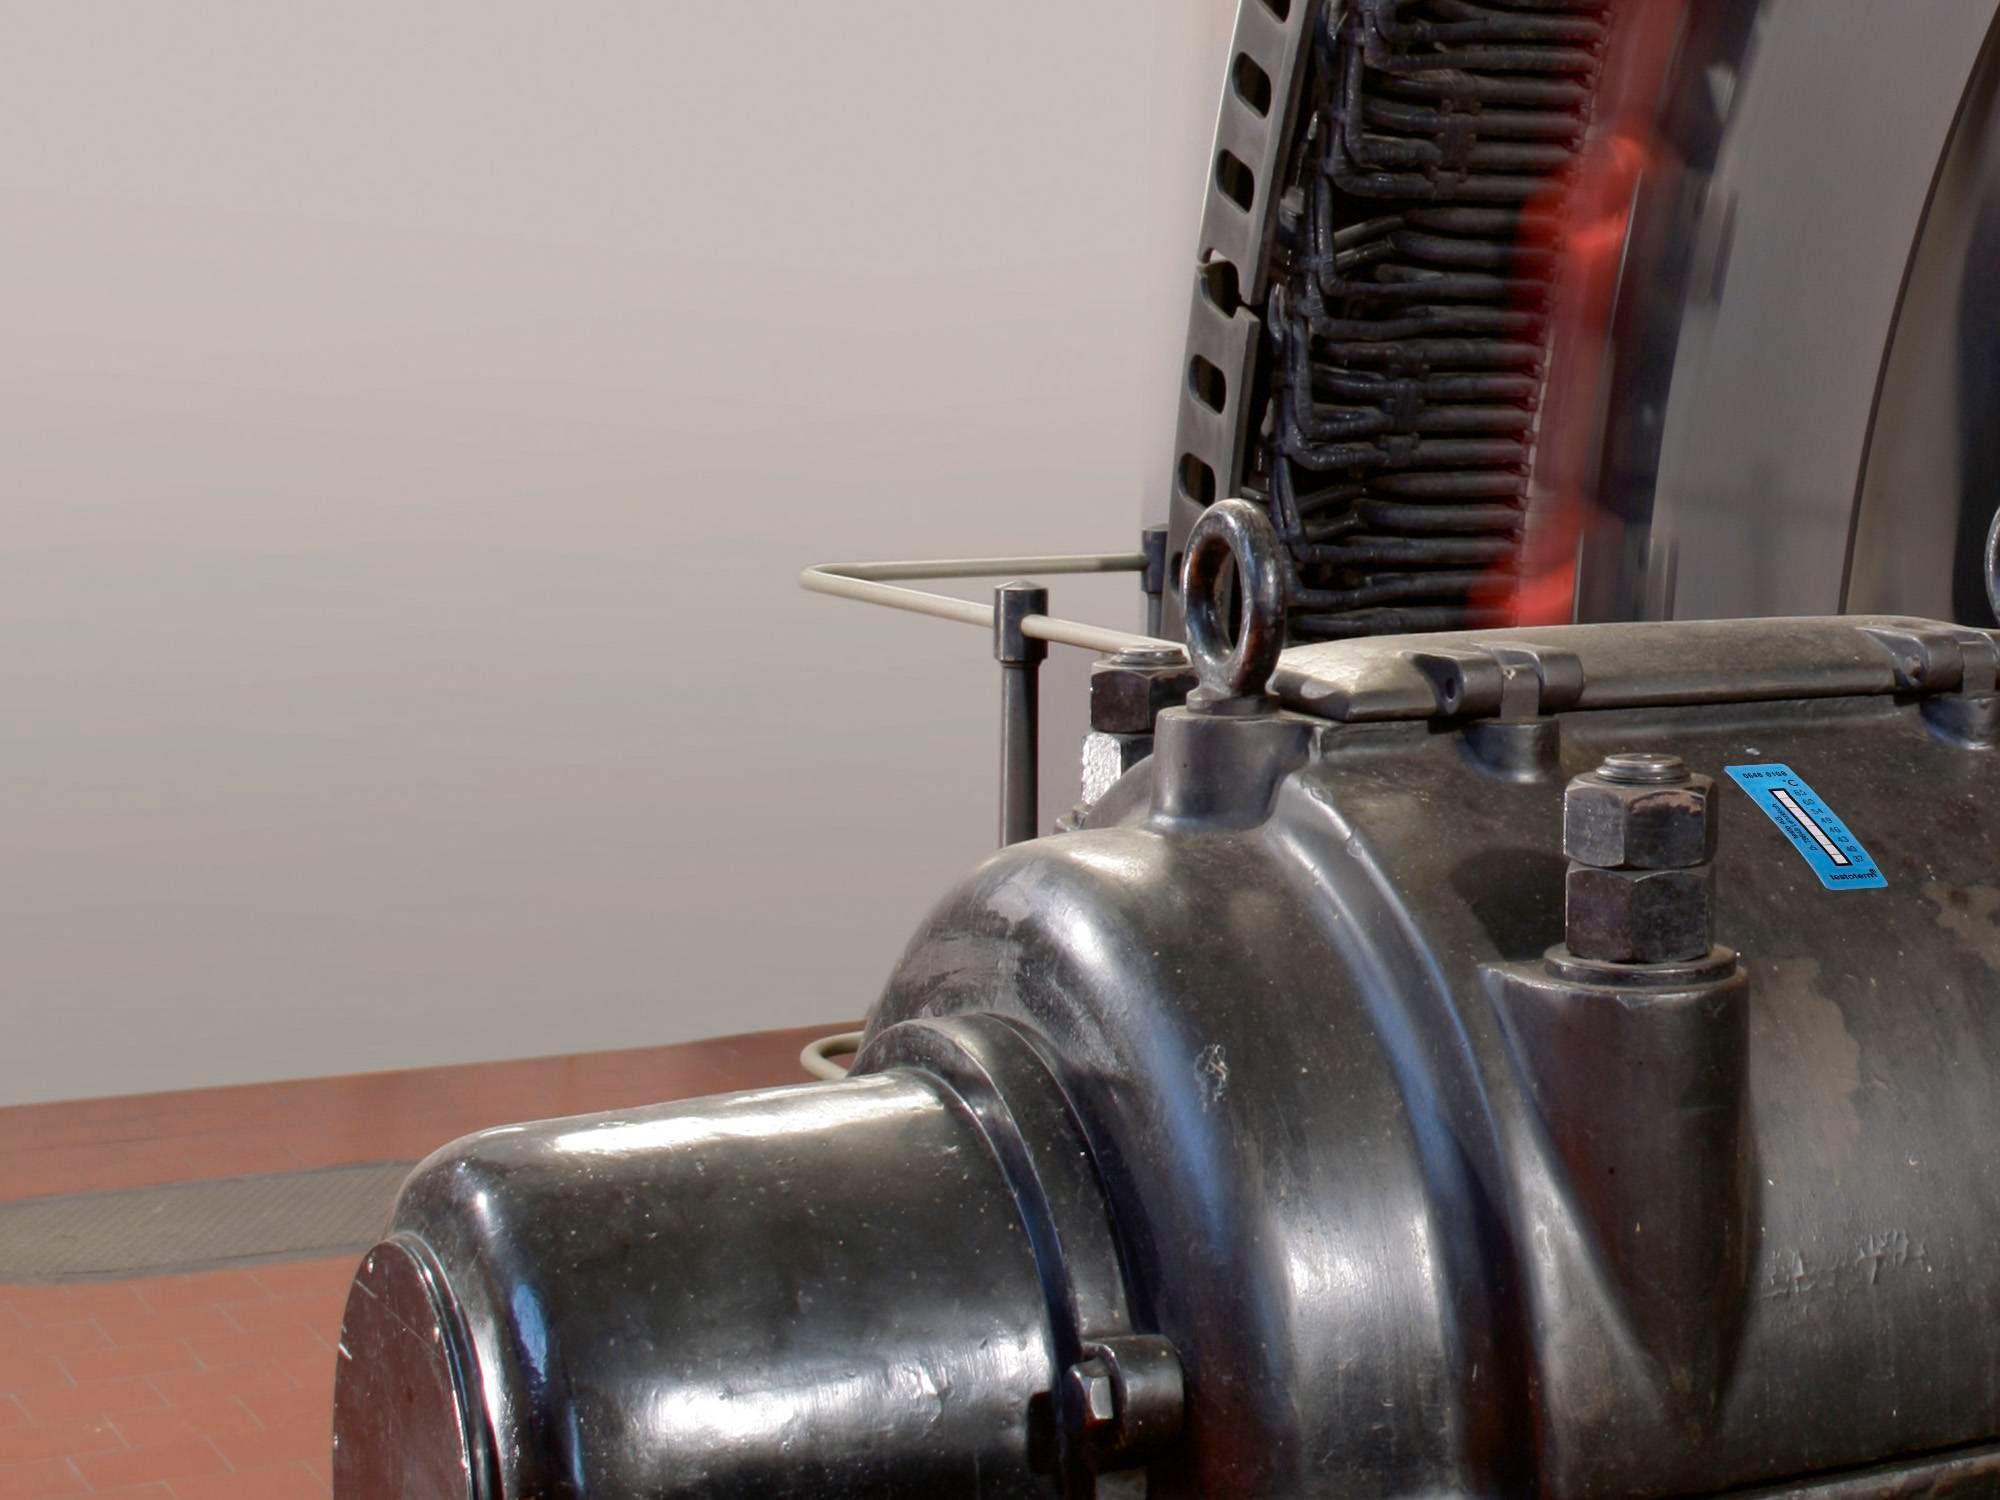 POP-Temperaturmessstreifen-Anwendung-Generator-2.jpg